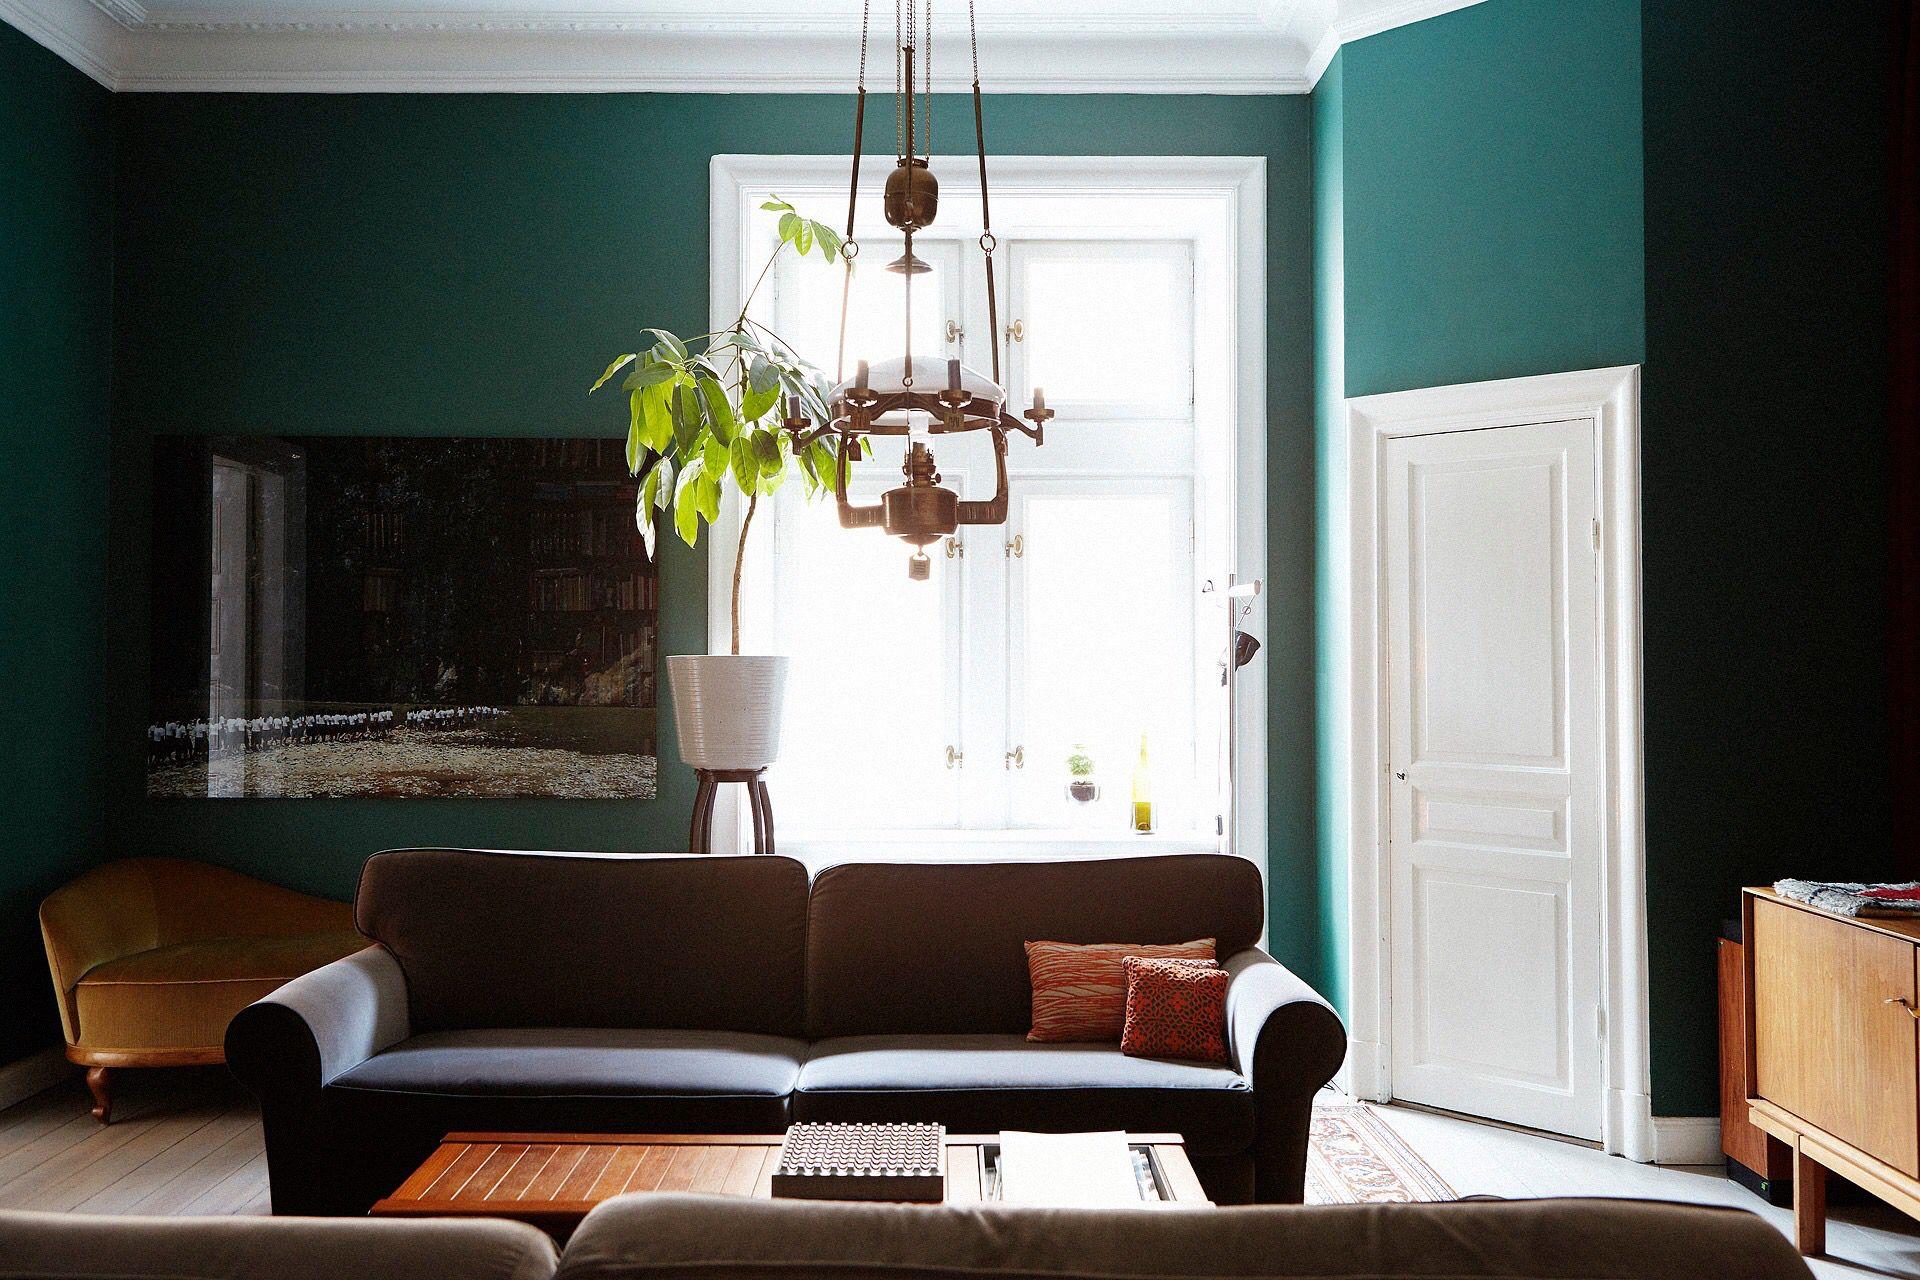 Green walls | H o m e . Sweet home. | Pinterest | Green walls